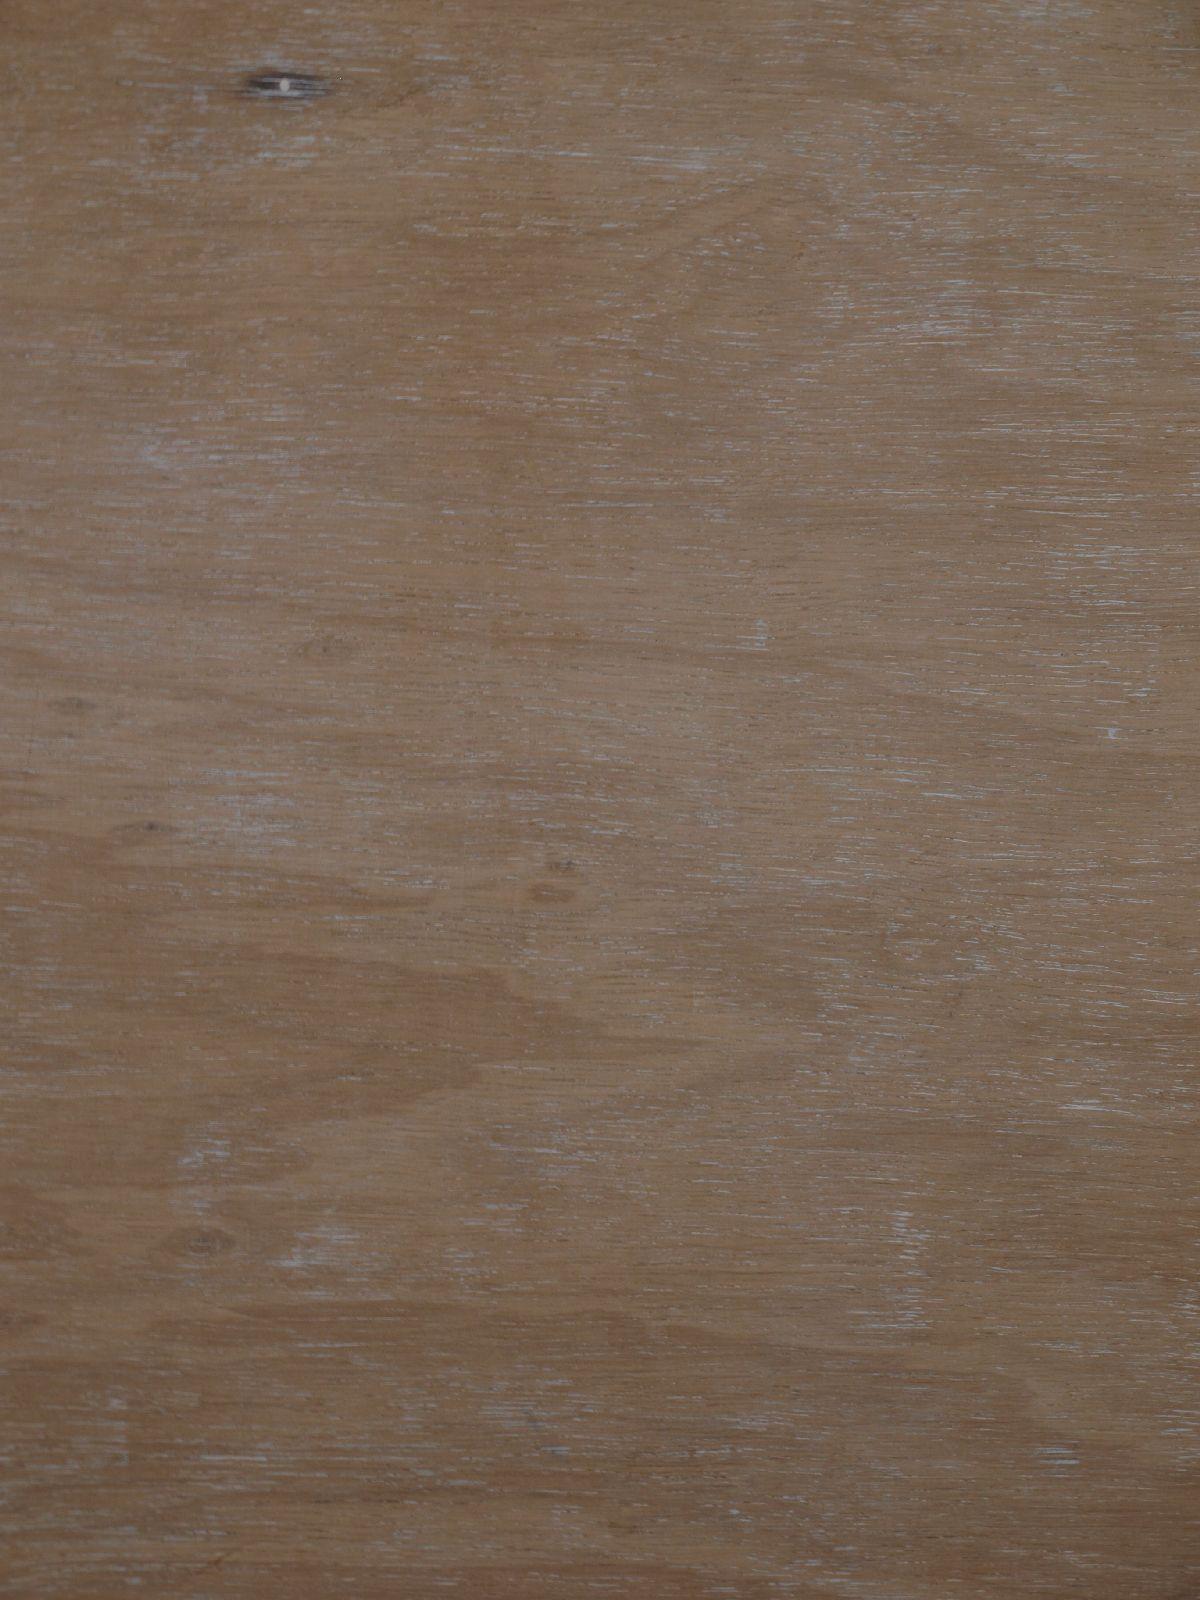 Wood_Texture_A_P9209808